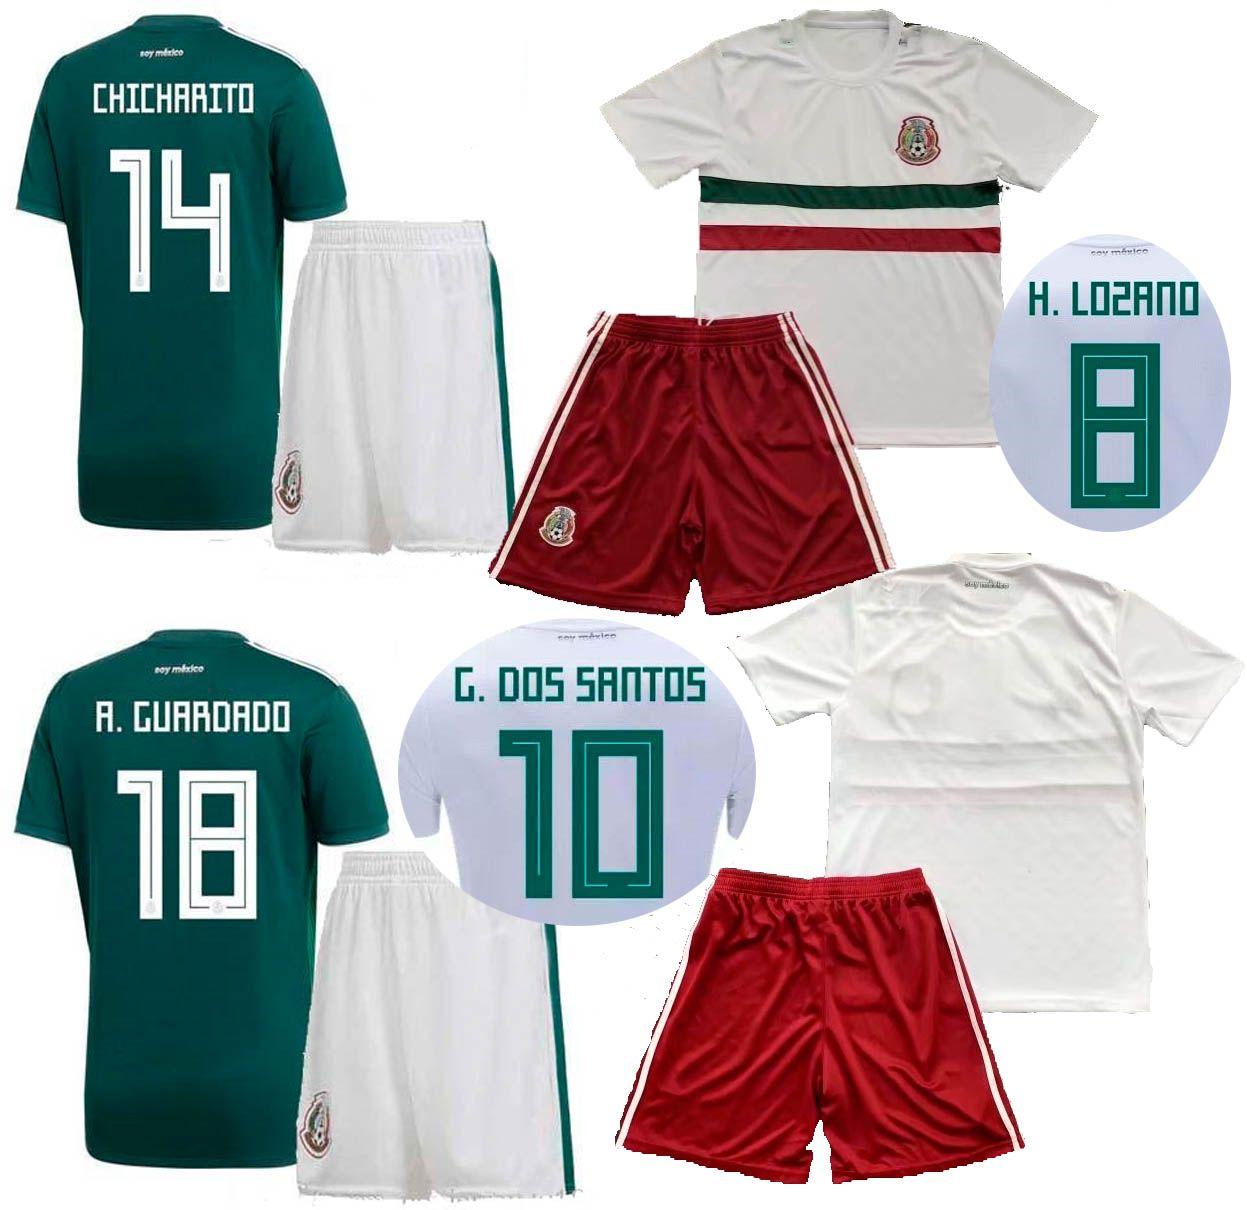 Compre 2018 CAMPEONATO DO MUNDO México Casa Fora Camisas De Futebol Shorts  CHICHARITO LOZANO DOS SANTOS HERRERA LAYUN Conjuntos De Futebol Nacional  Uniforme ... 3f66317f69f40